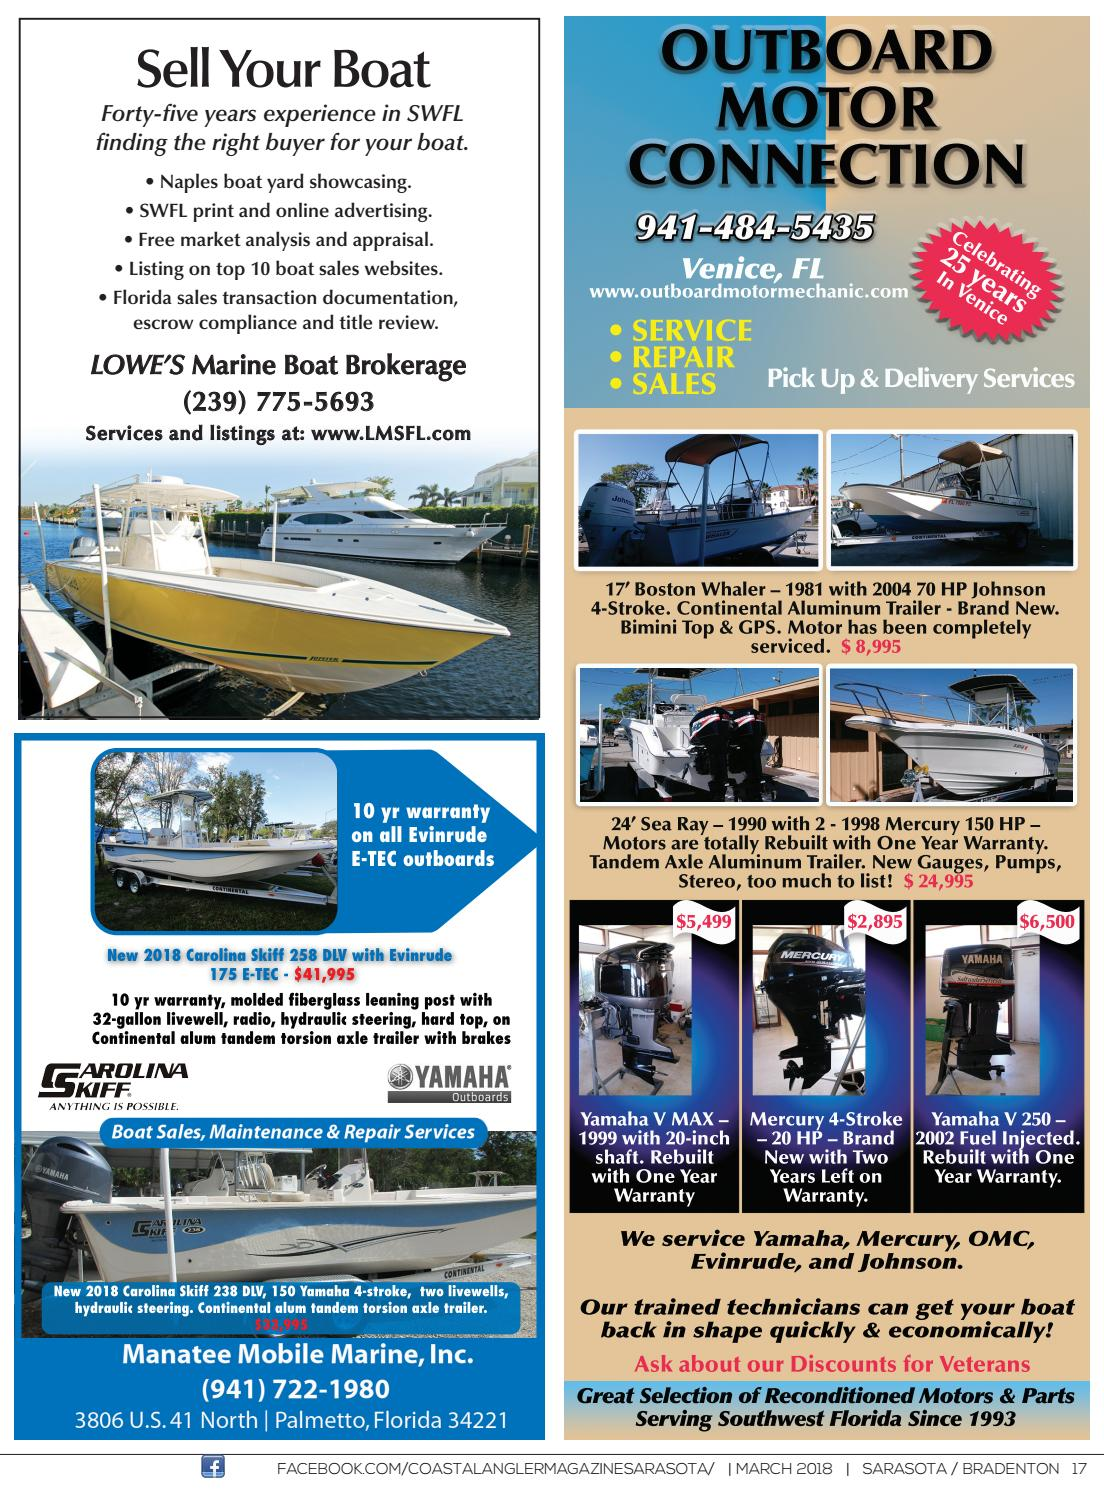 Coastal Angler Magazine - March / Sarasota by Coastal Angler